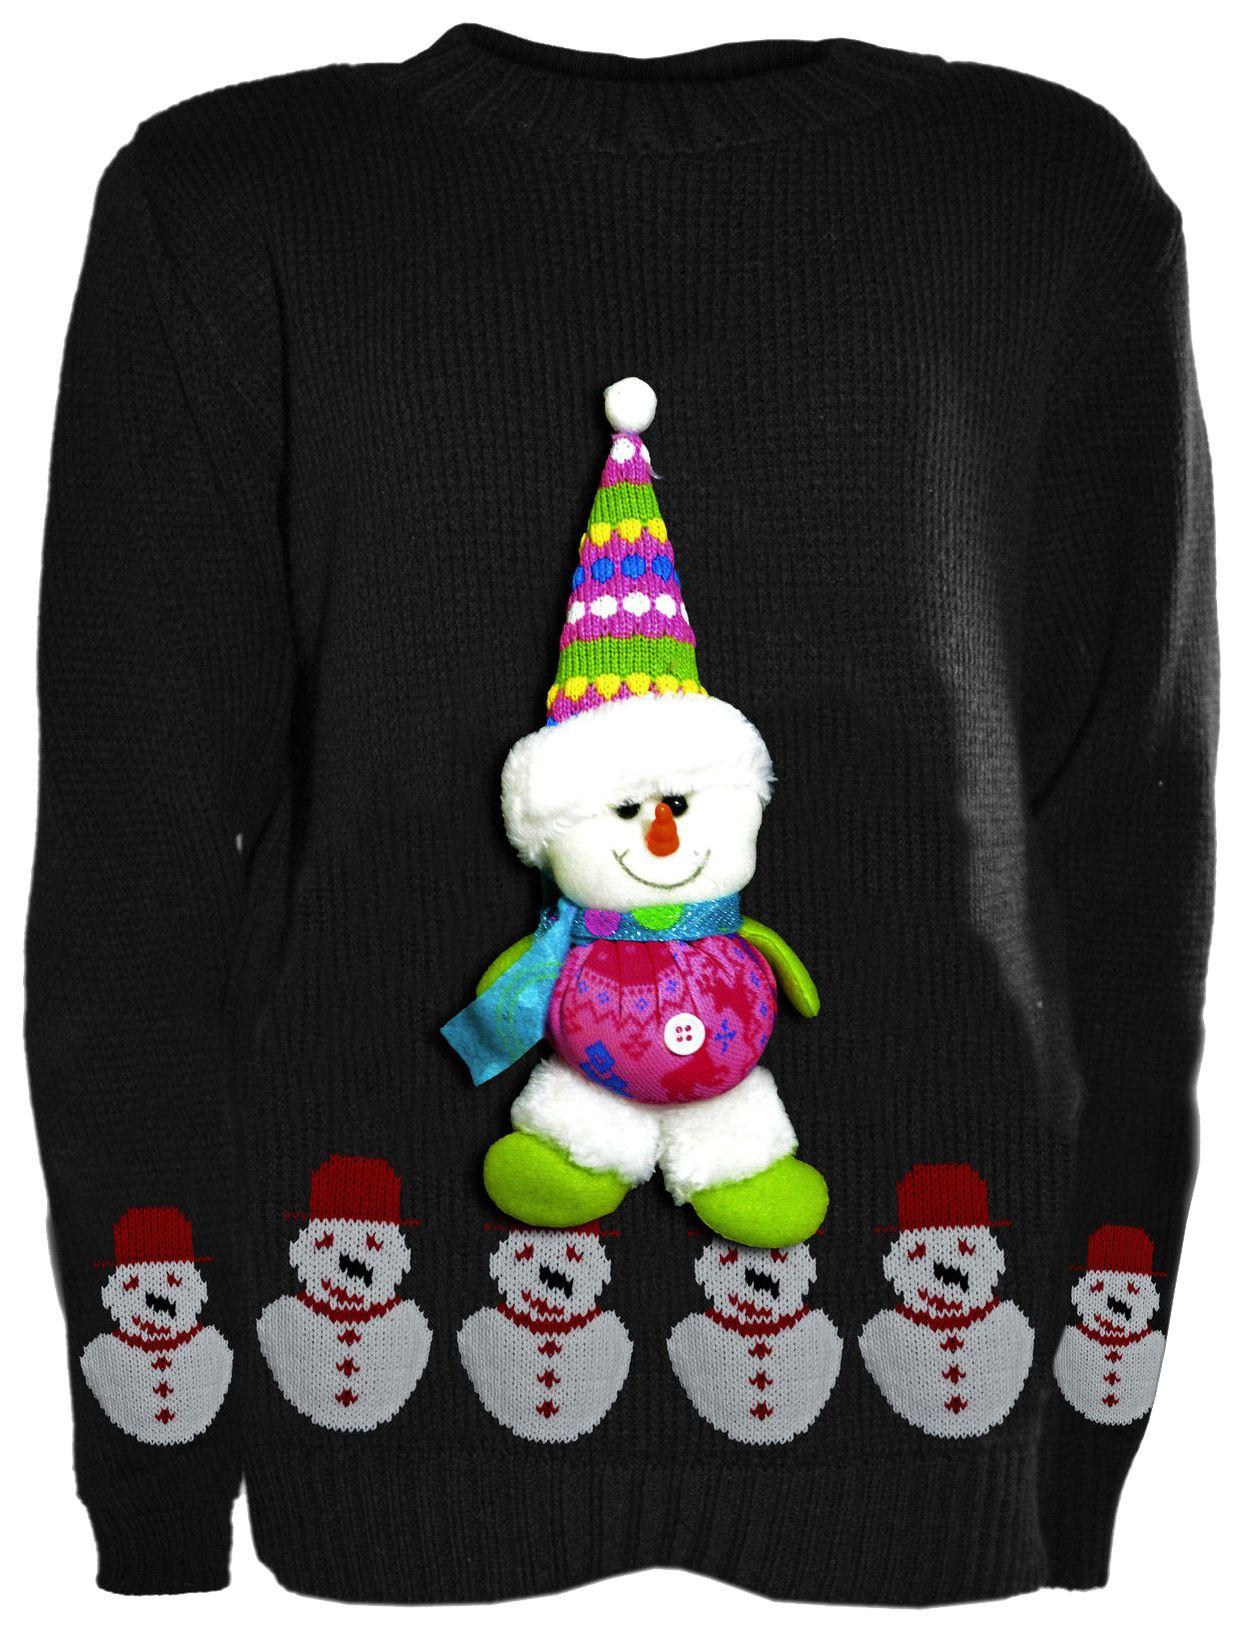 new boys girls kids novelty christmas jumpers knitted3d. Black Bedroom Furniture Sets. Home Design Ideas